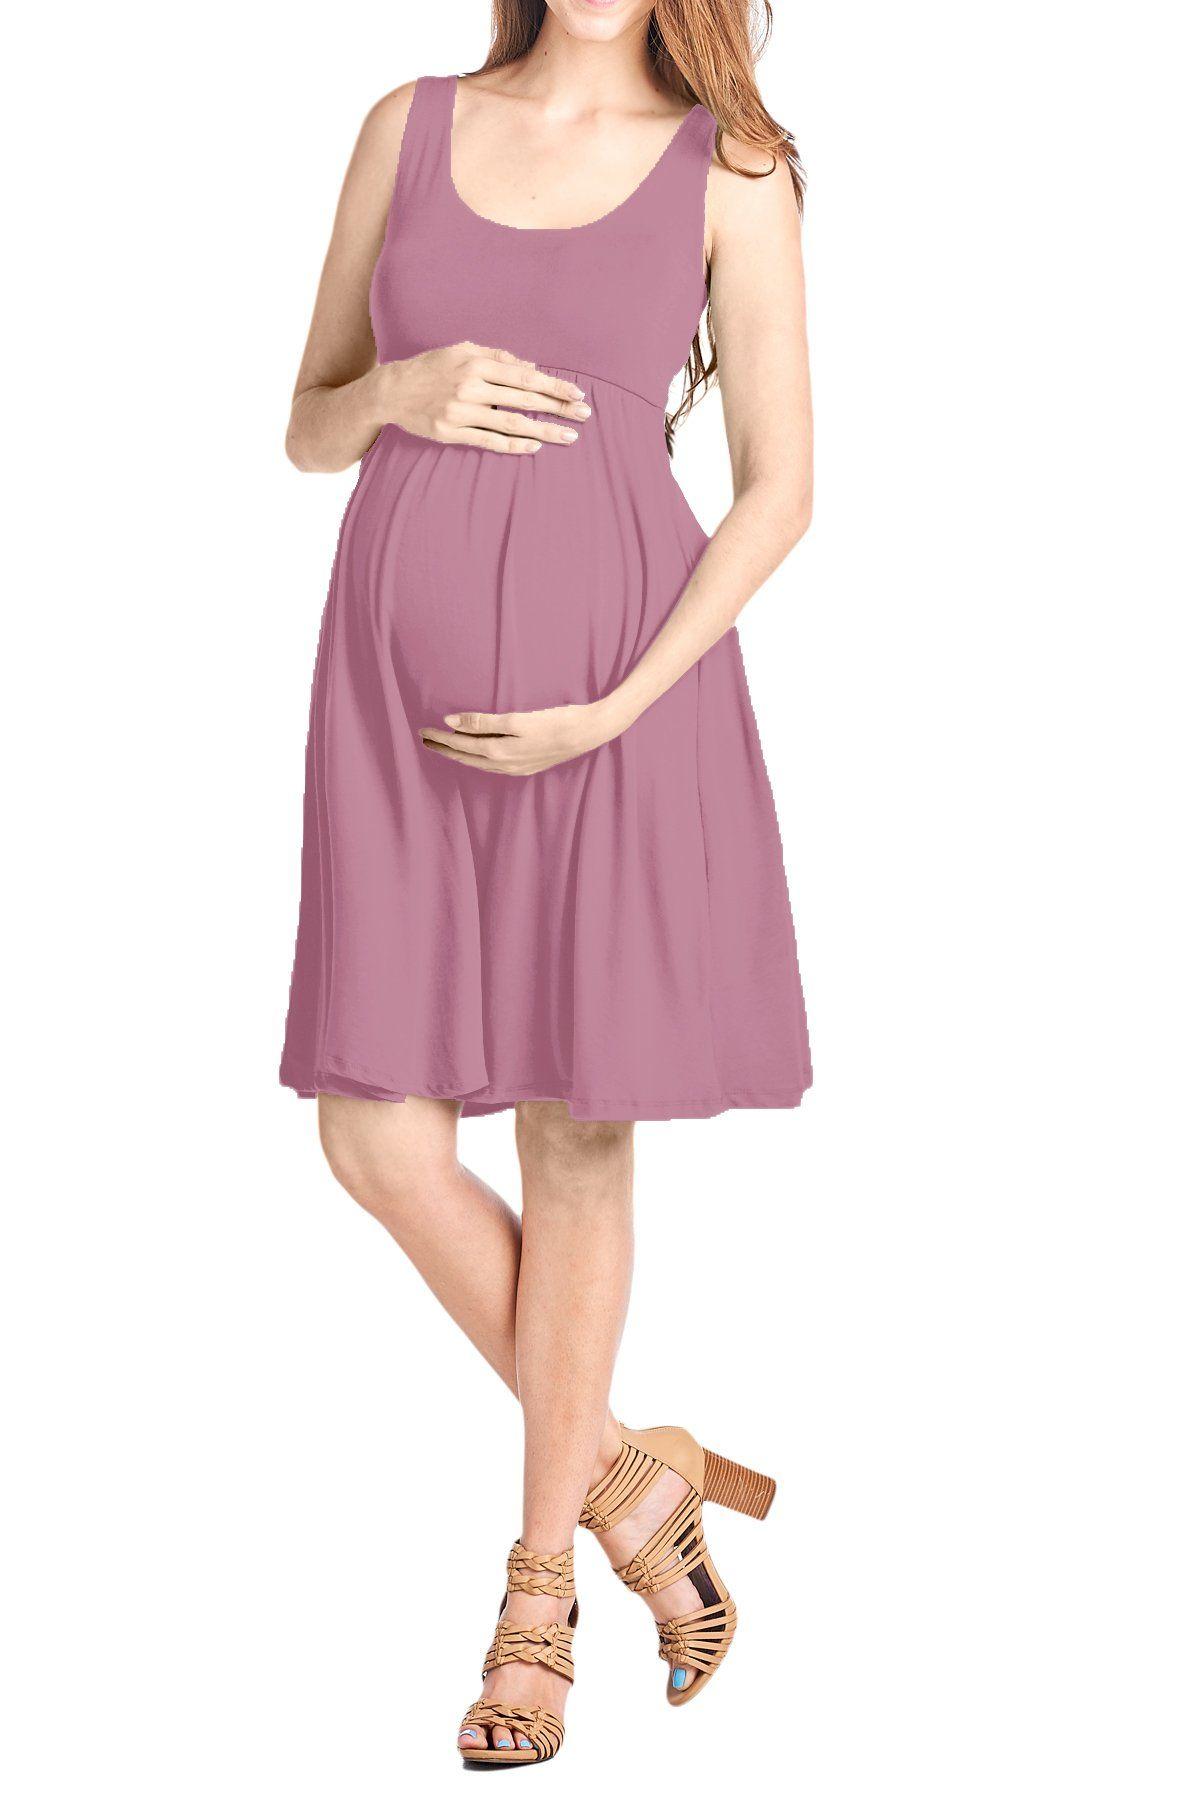 b4db295f1df06 Maternity Styles - beautiful maternity dresses : Beachcoco Womens Maternity  Knee Length Tank Dress L Plum Pink ** Click photo for more information.